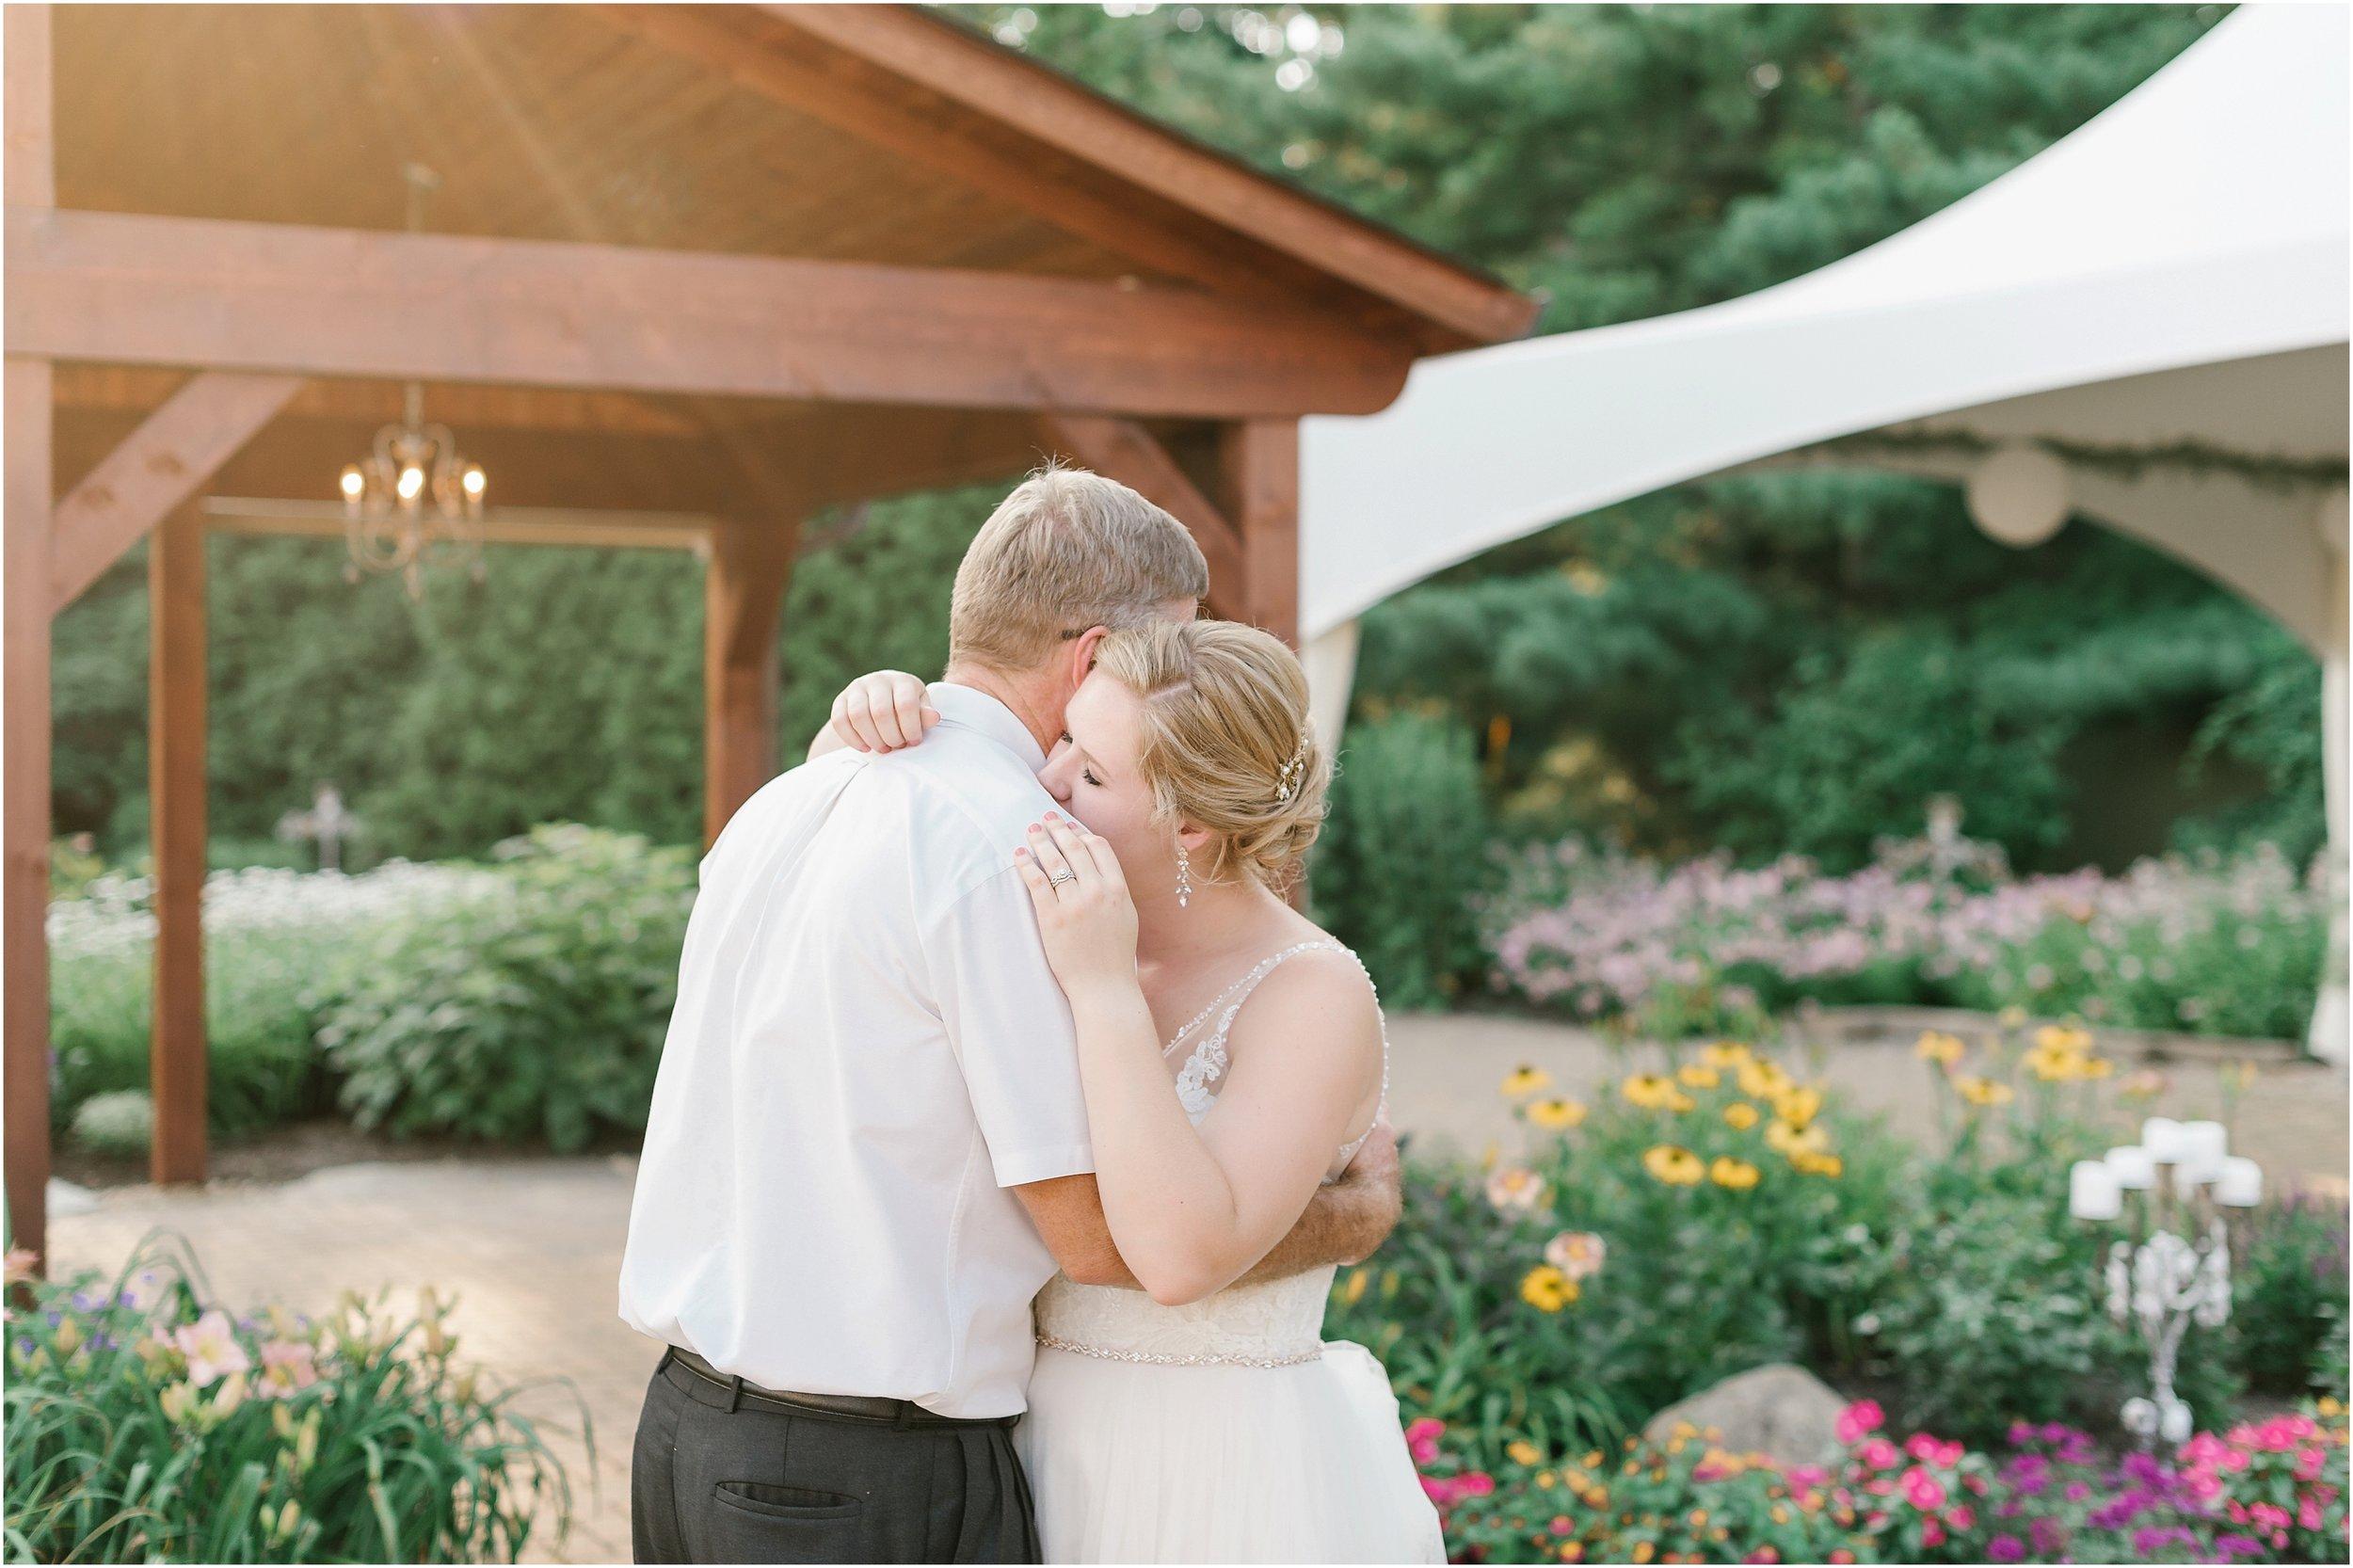 Rebecca_Shehorn_Photography_Indianapolis_Wedding_Photographer_8516.jpg